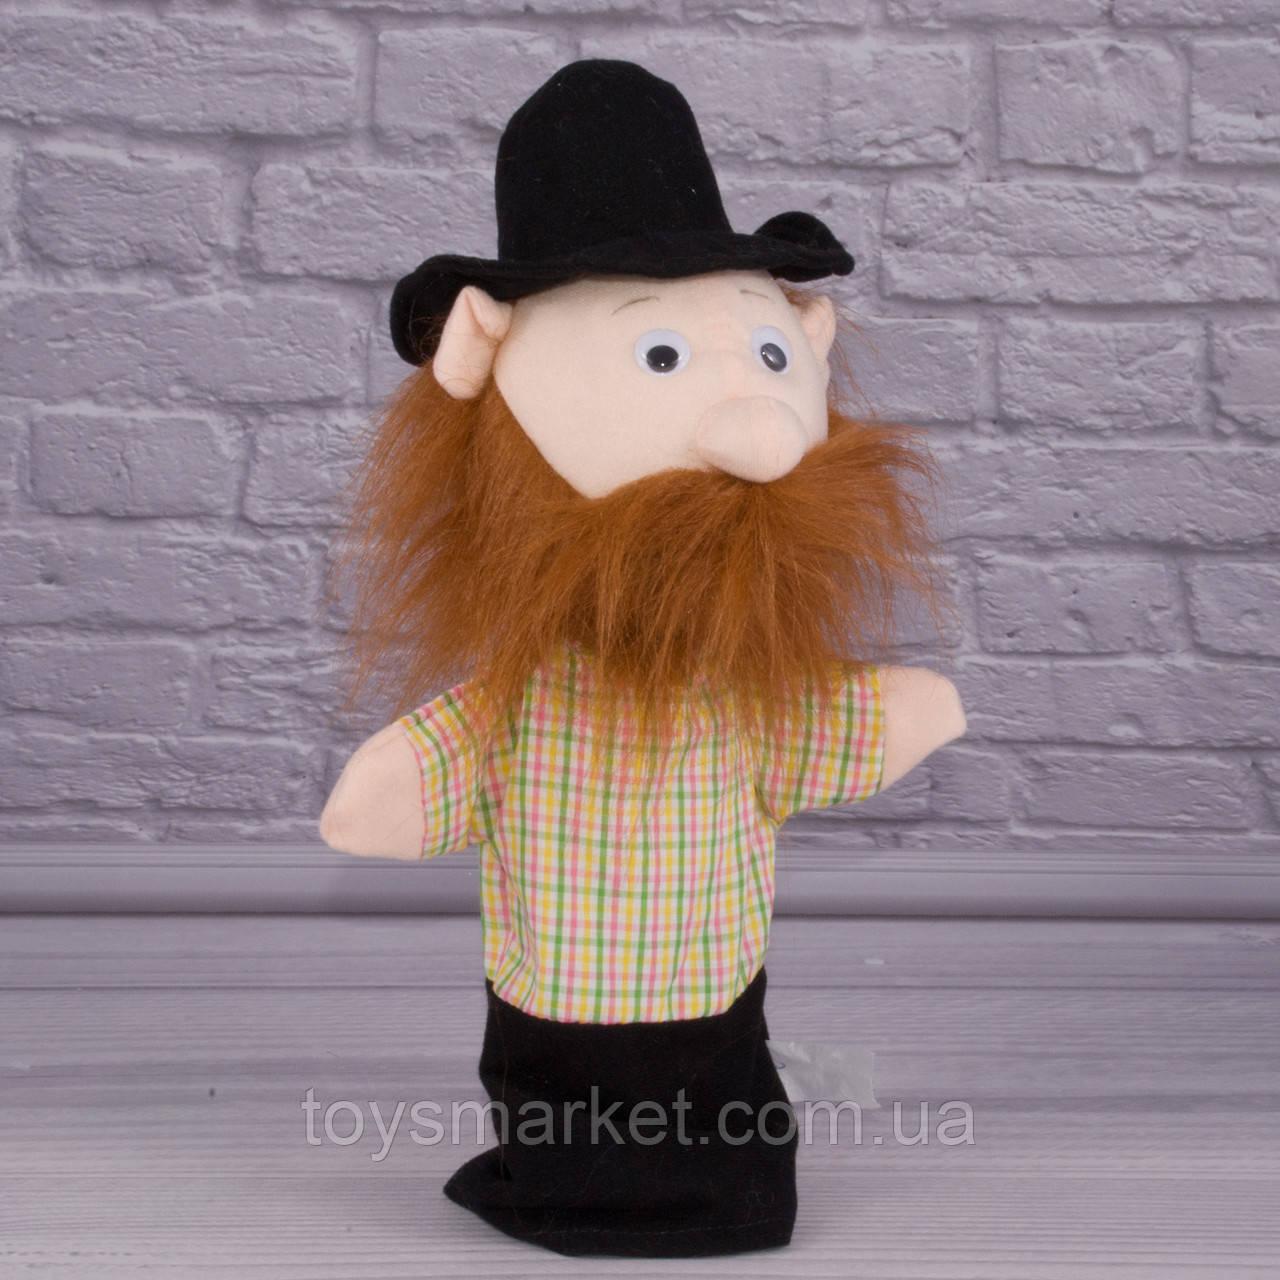 Игрушка рукавичка для кукольного театра Разбойник, кукла перчатка на руку